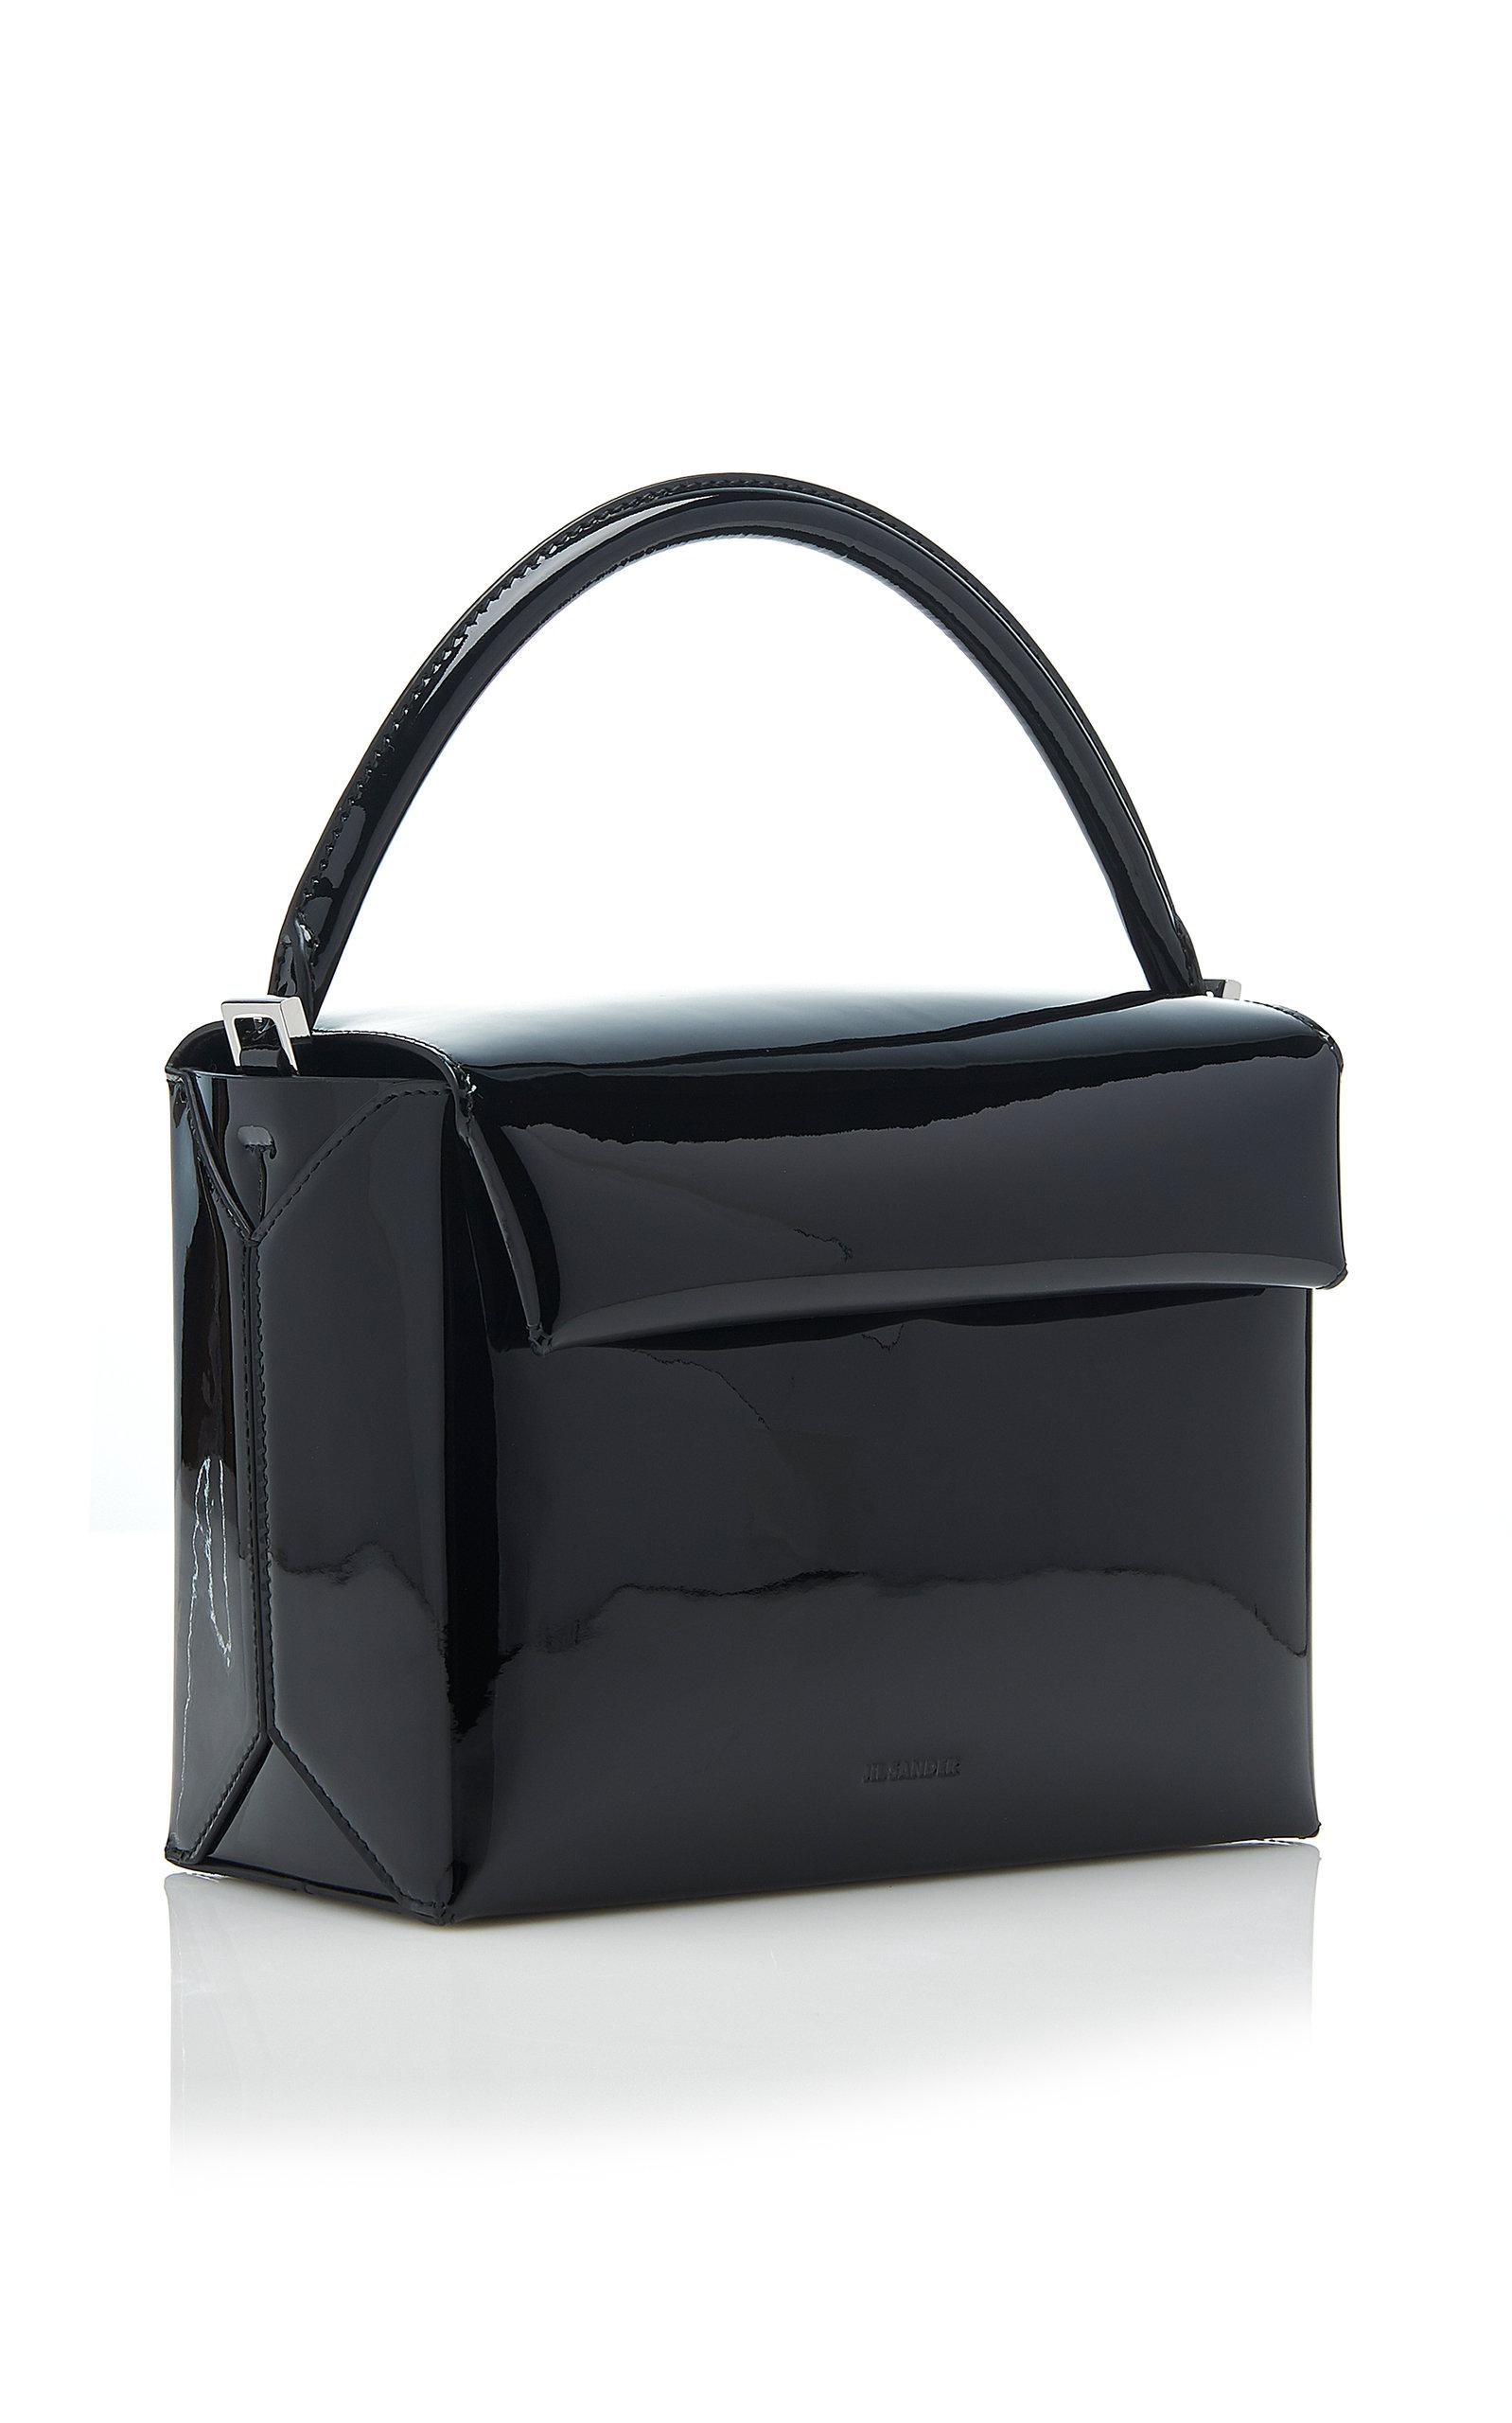 4c680bb27a Jil SanderLeather Envelope Box Bag. CLOSE. Loading. Loading. Loading.  Loading